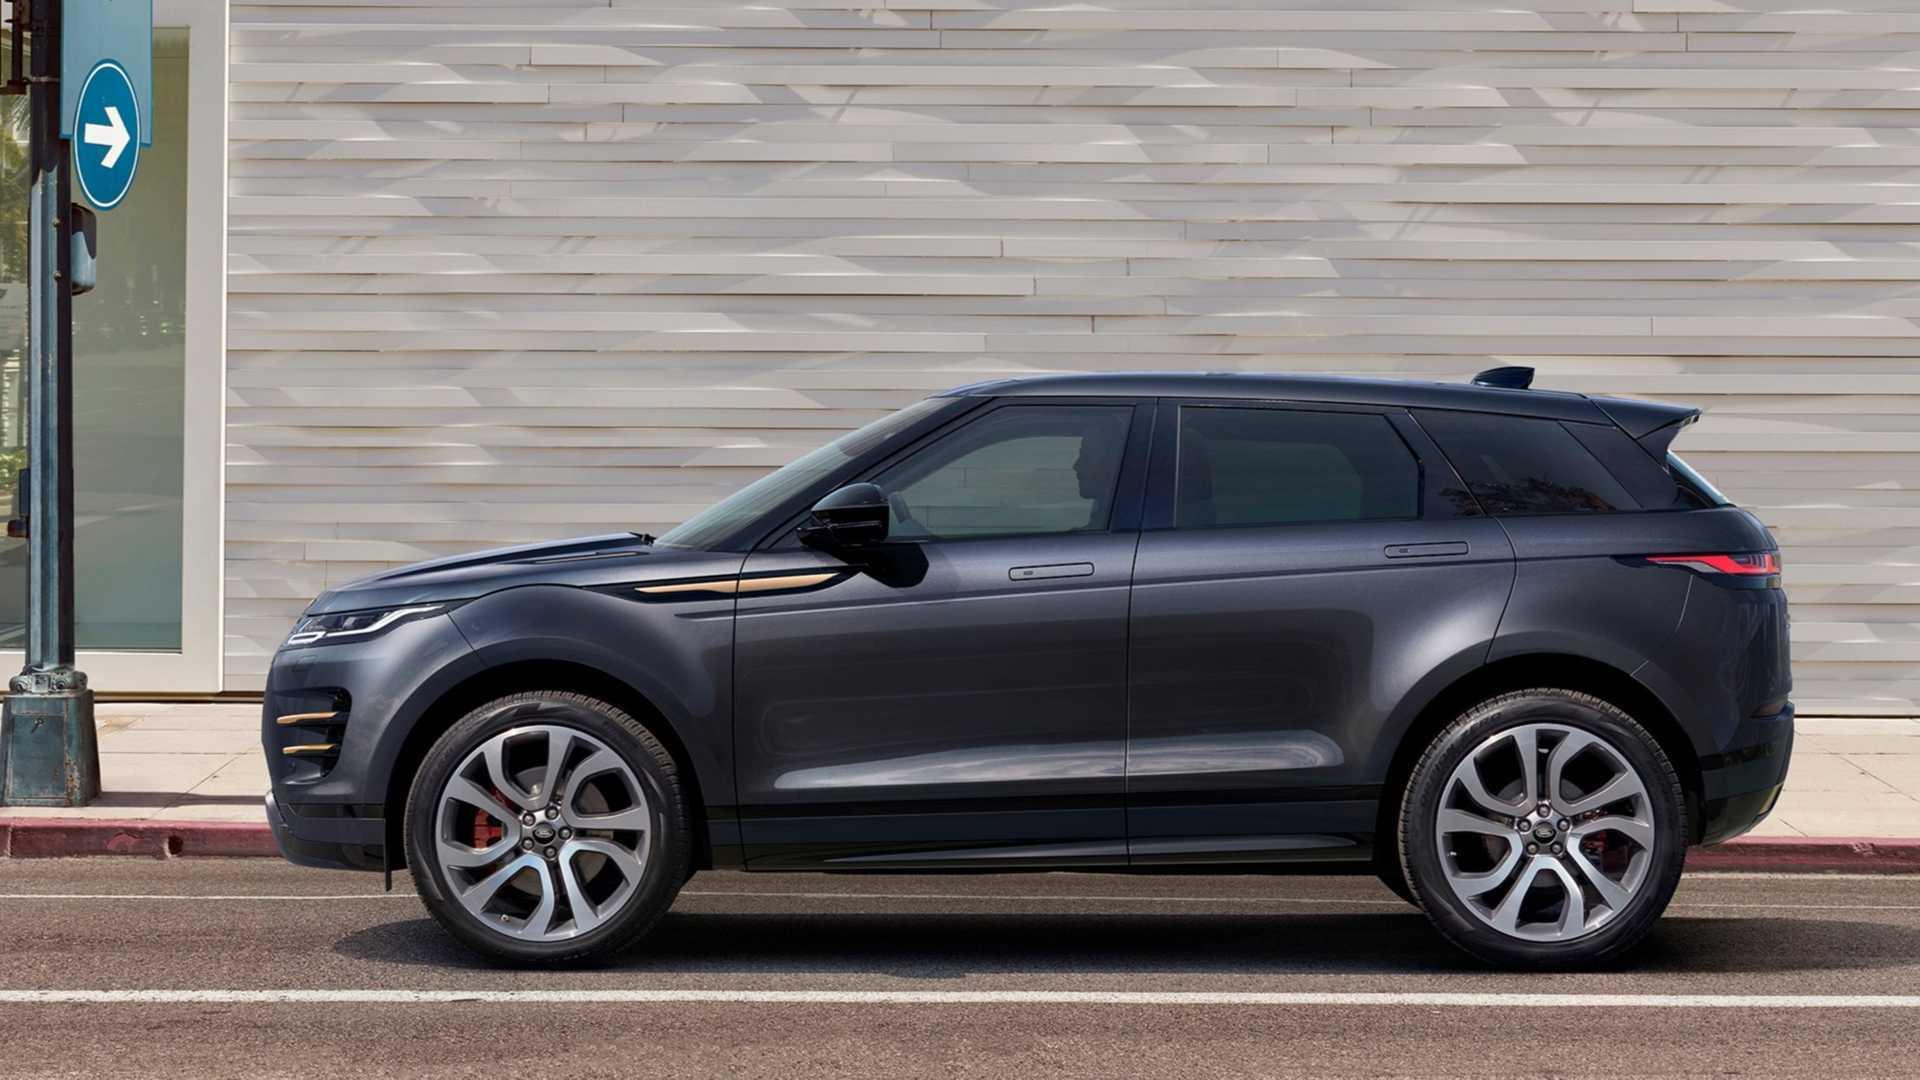 Водителя Range Rover оштрафовали на 2700 евро за езду по пляжу